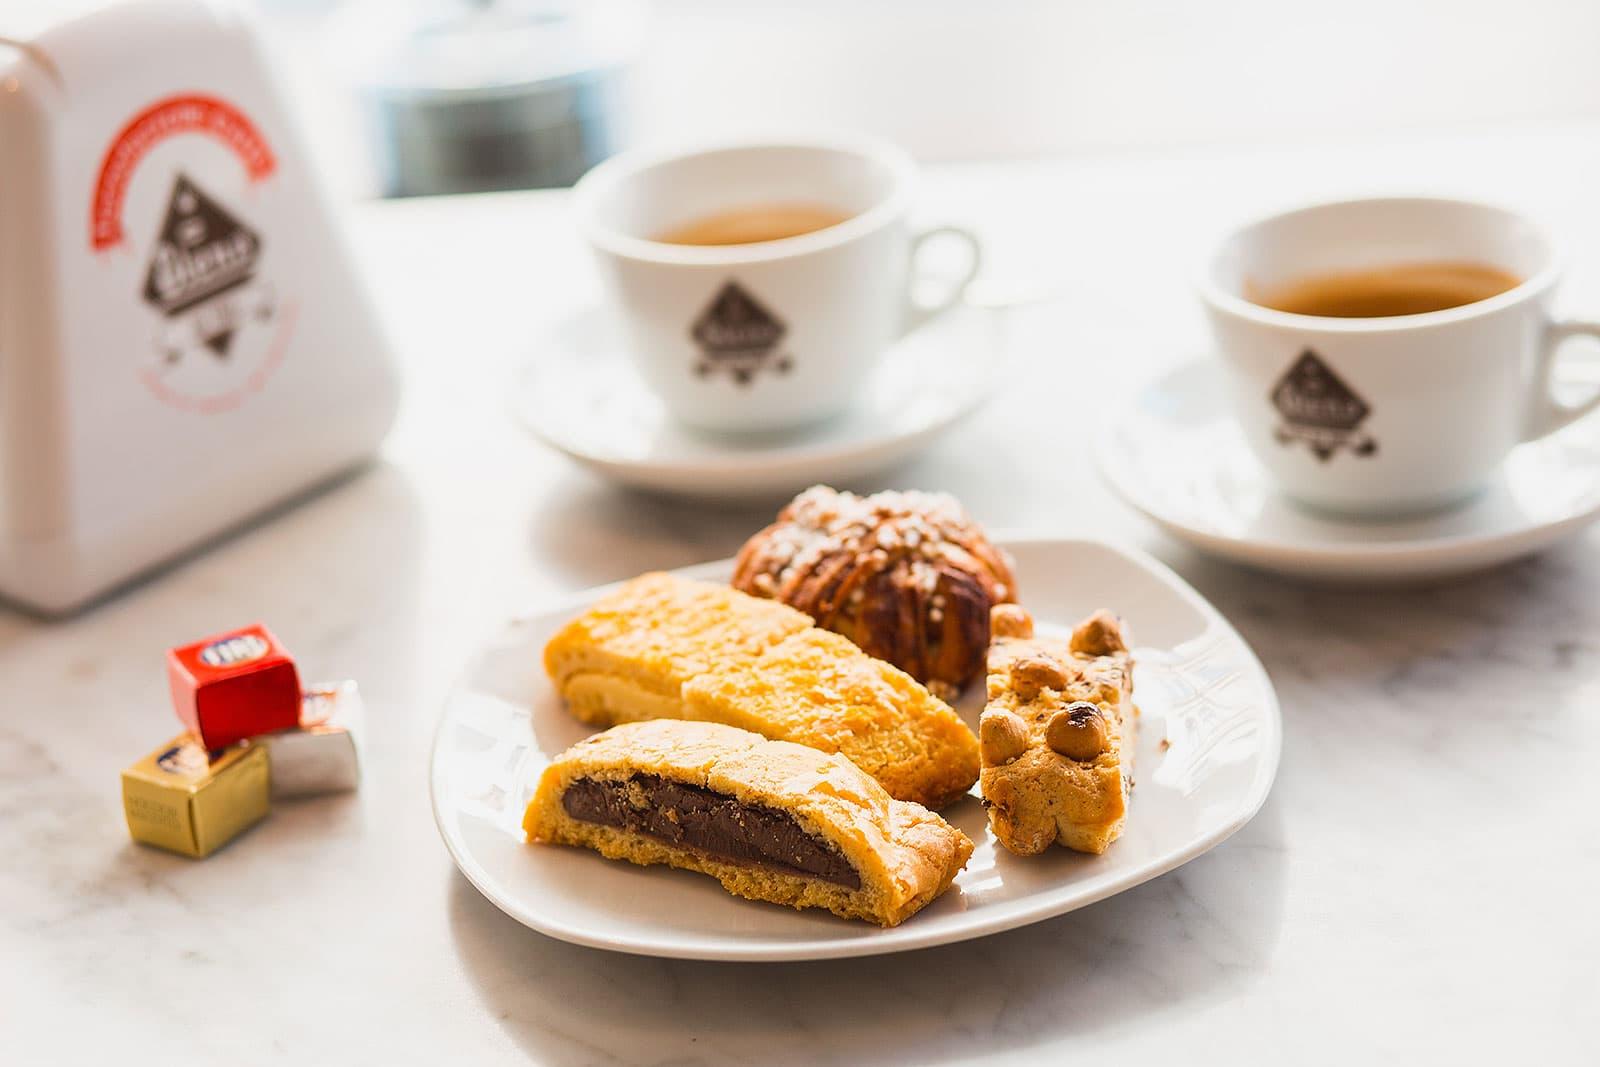 bra kaffe stockholm